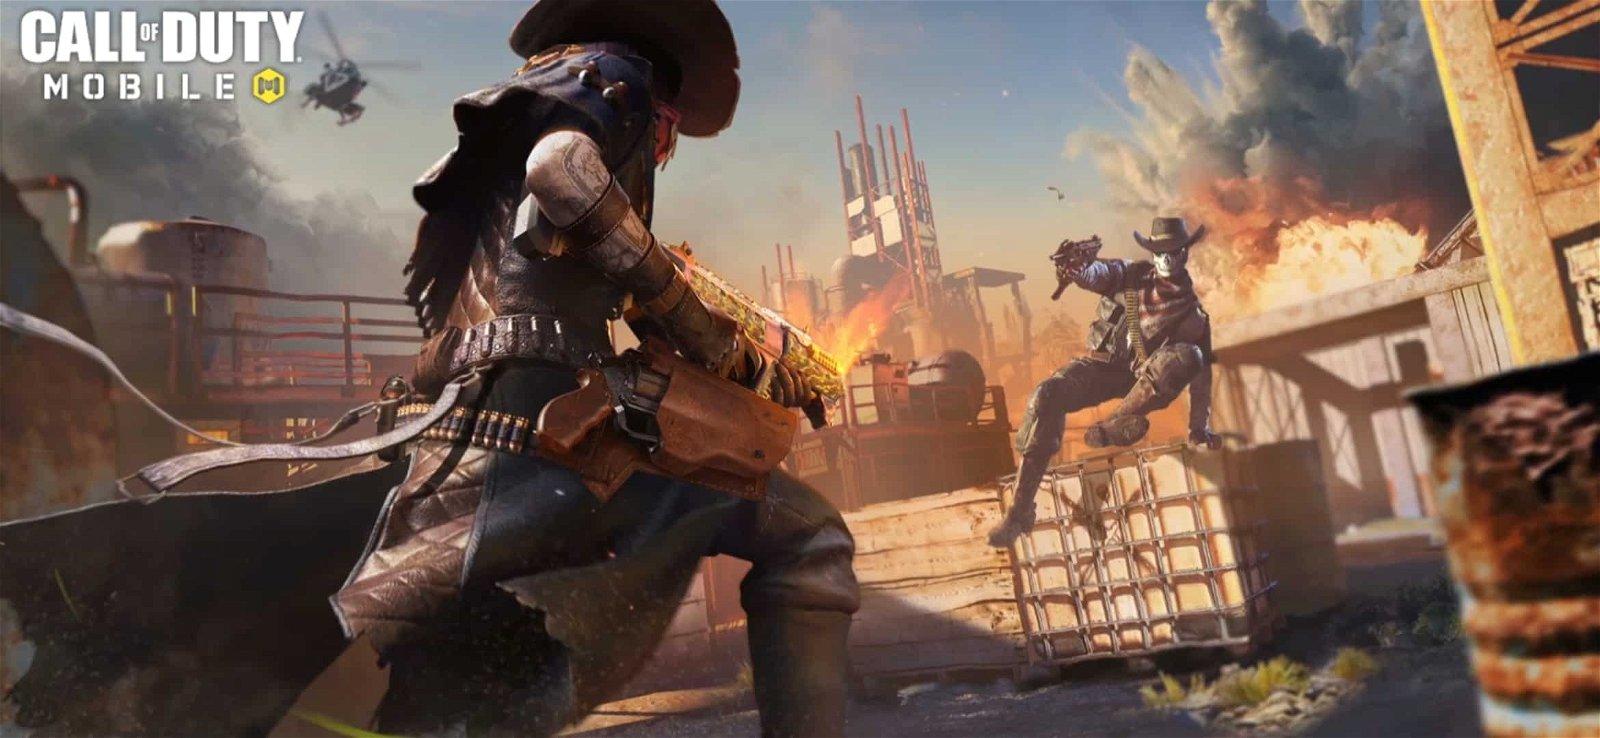 Call of Duty Mobile: Season 3 release date